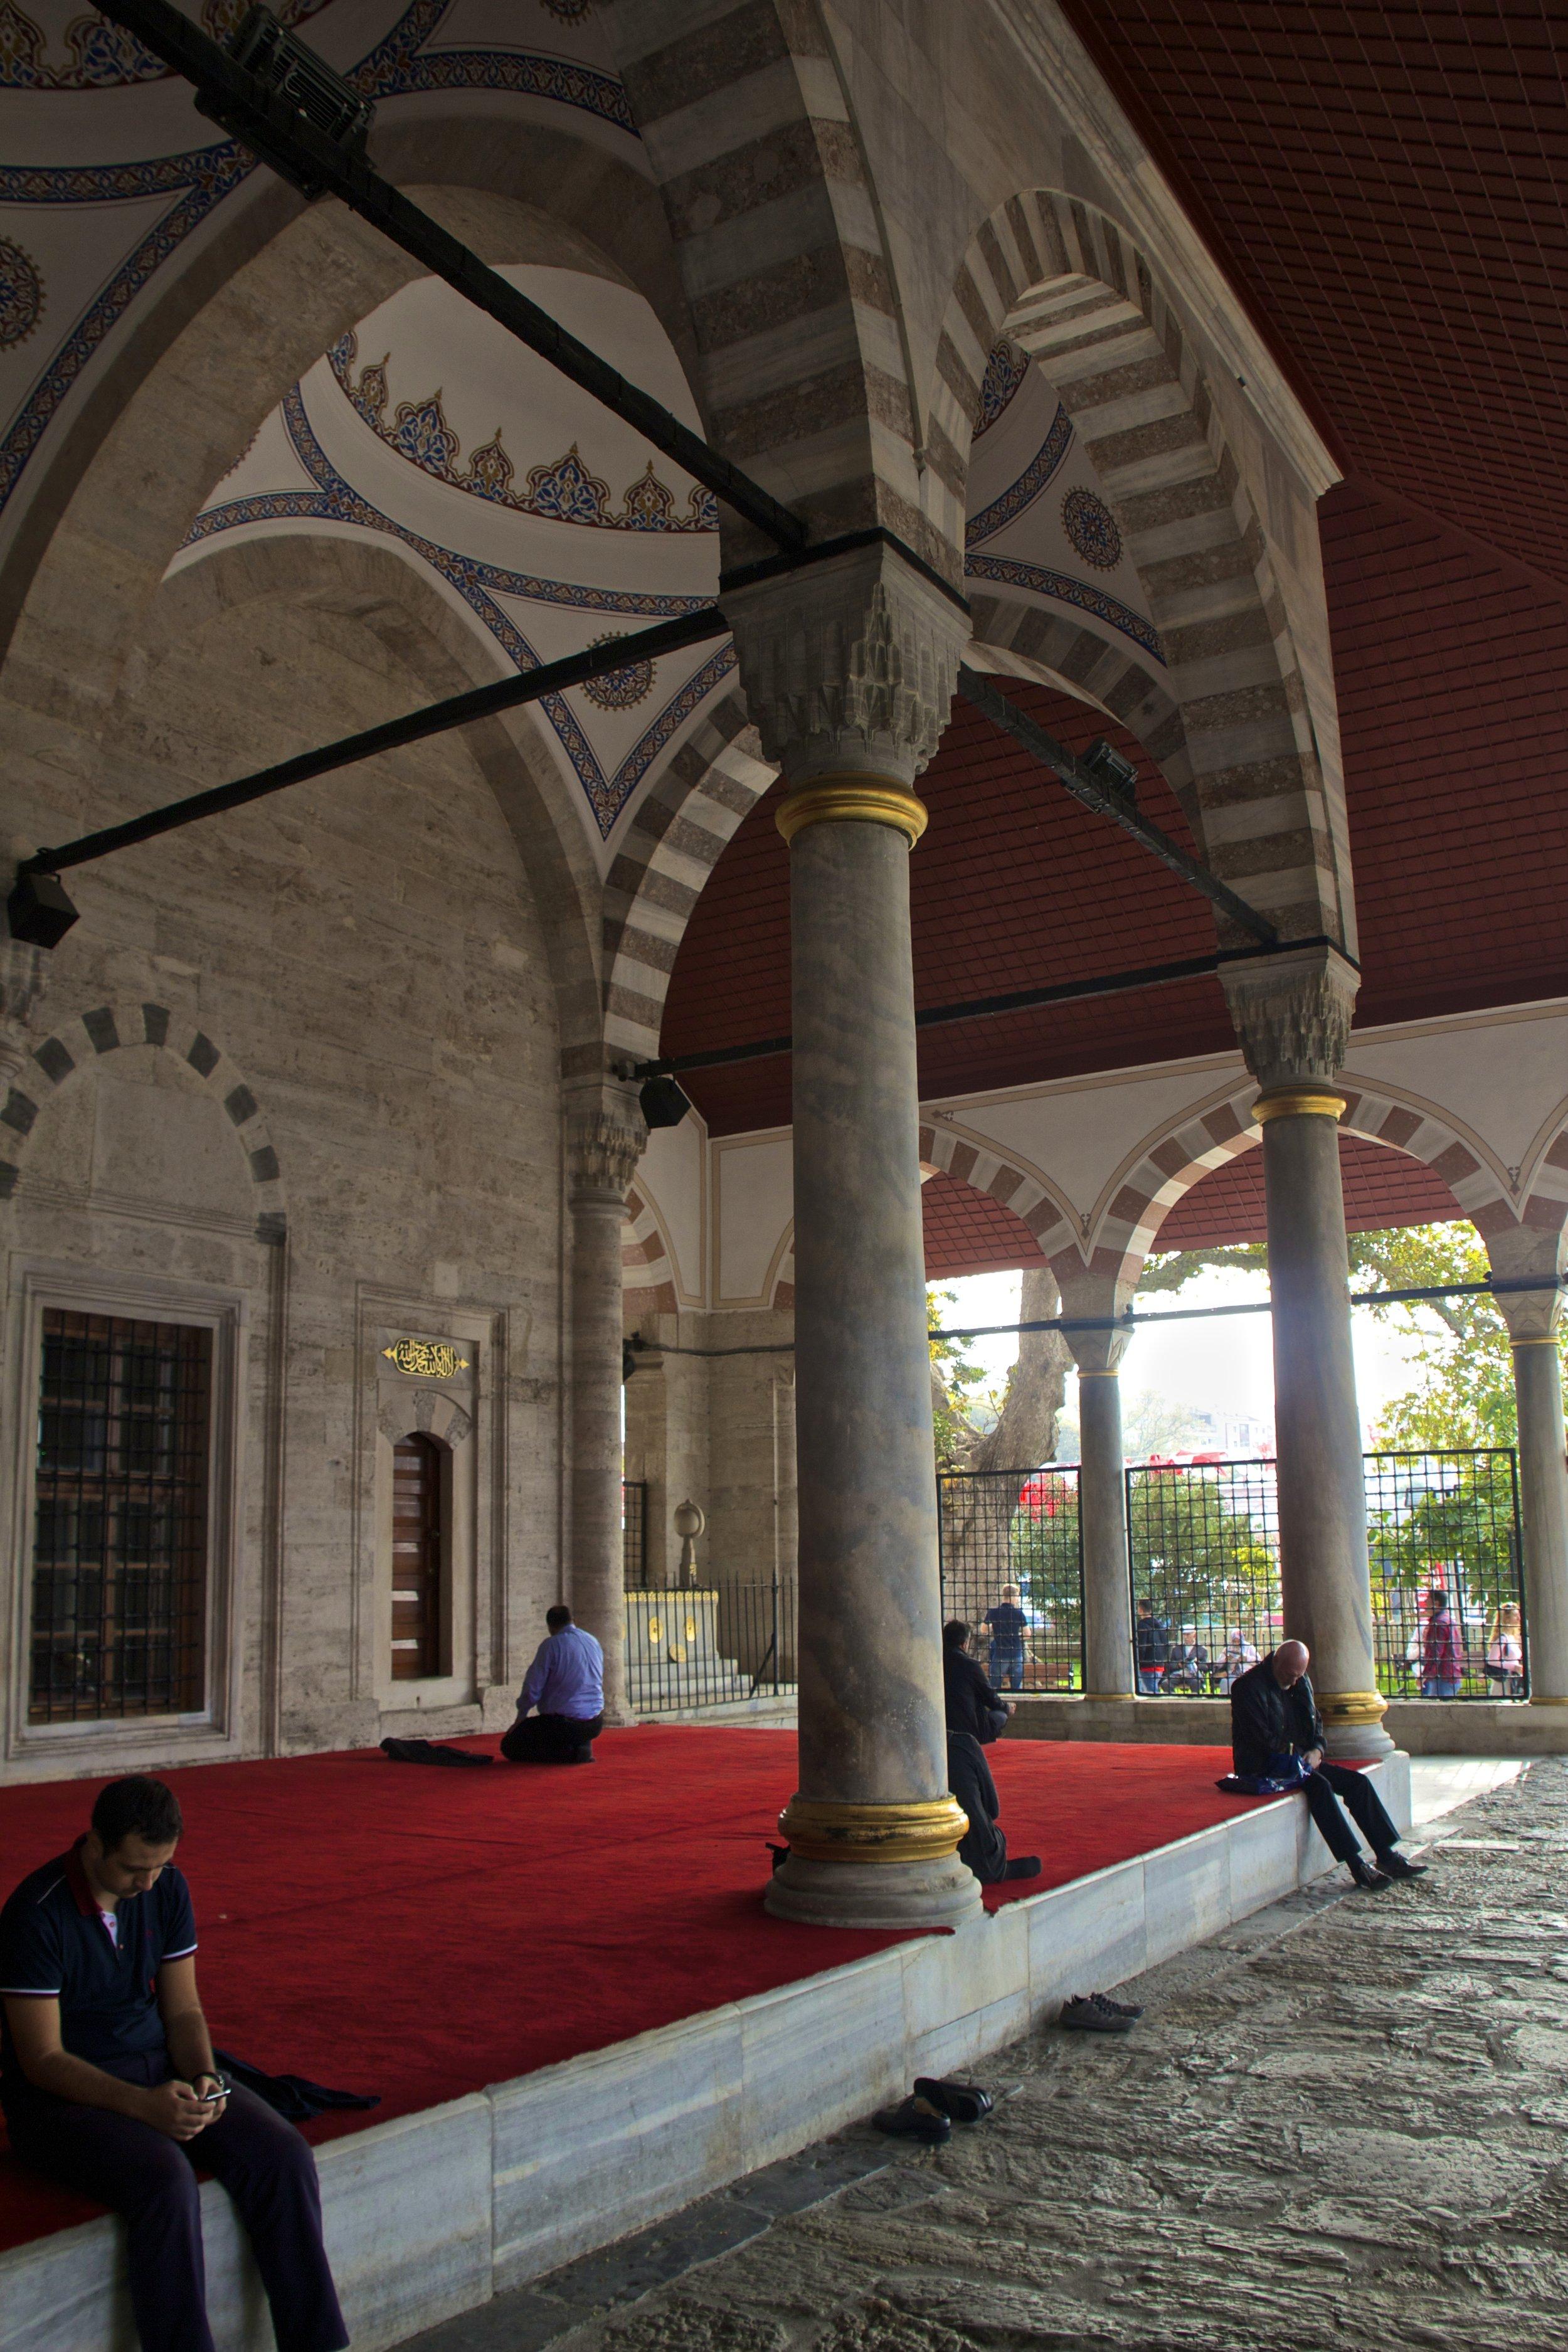 uskudar istanbul turkey 6.jpg